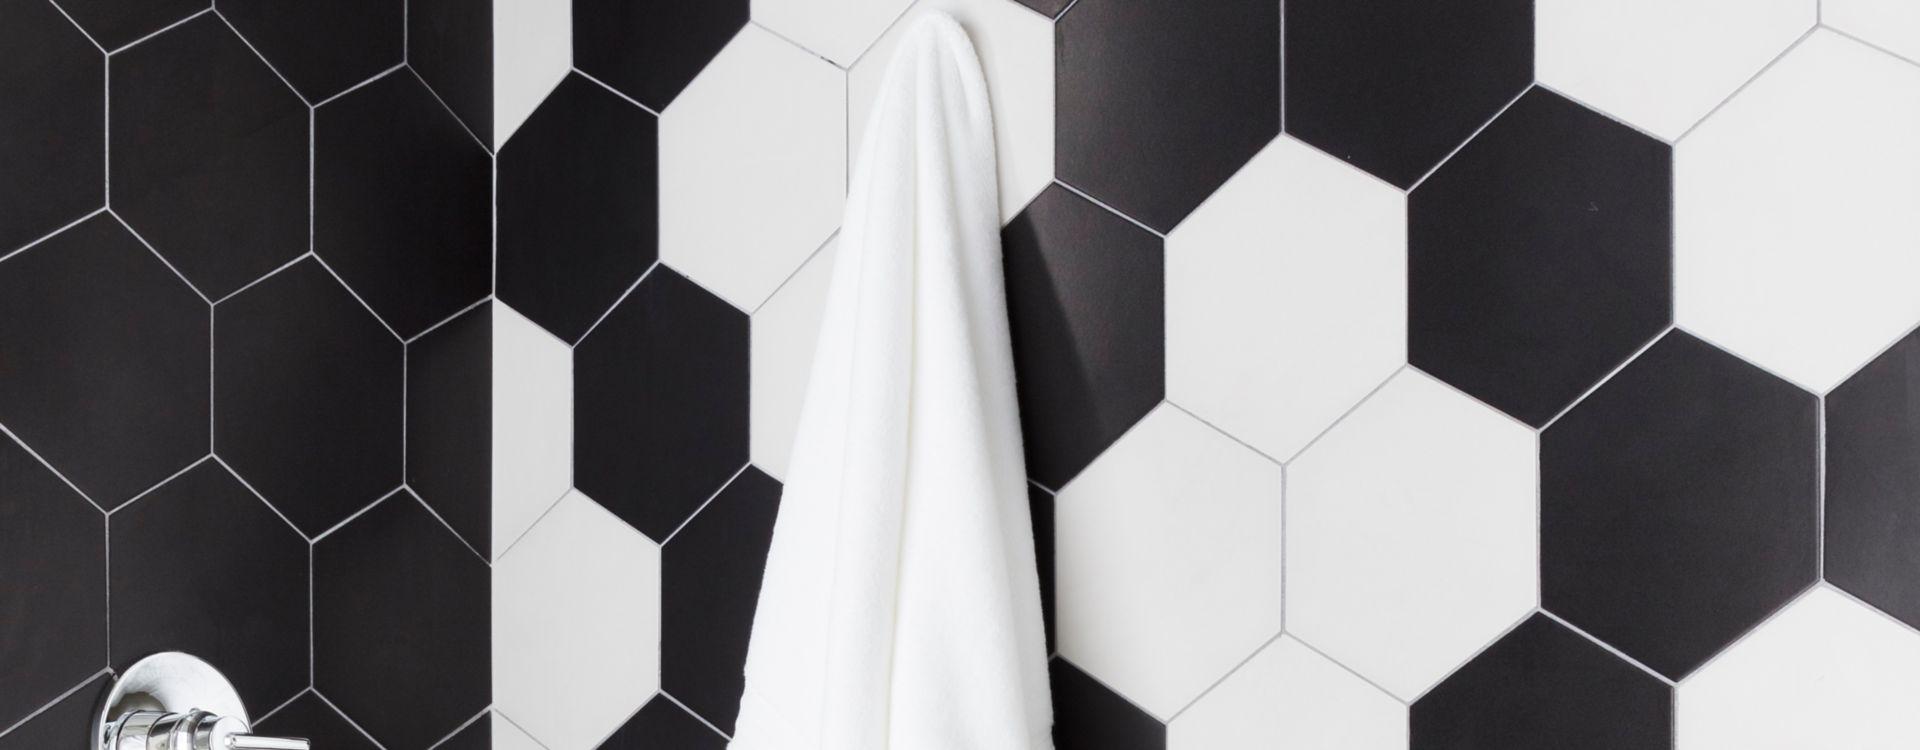 tile patterns for floors walls